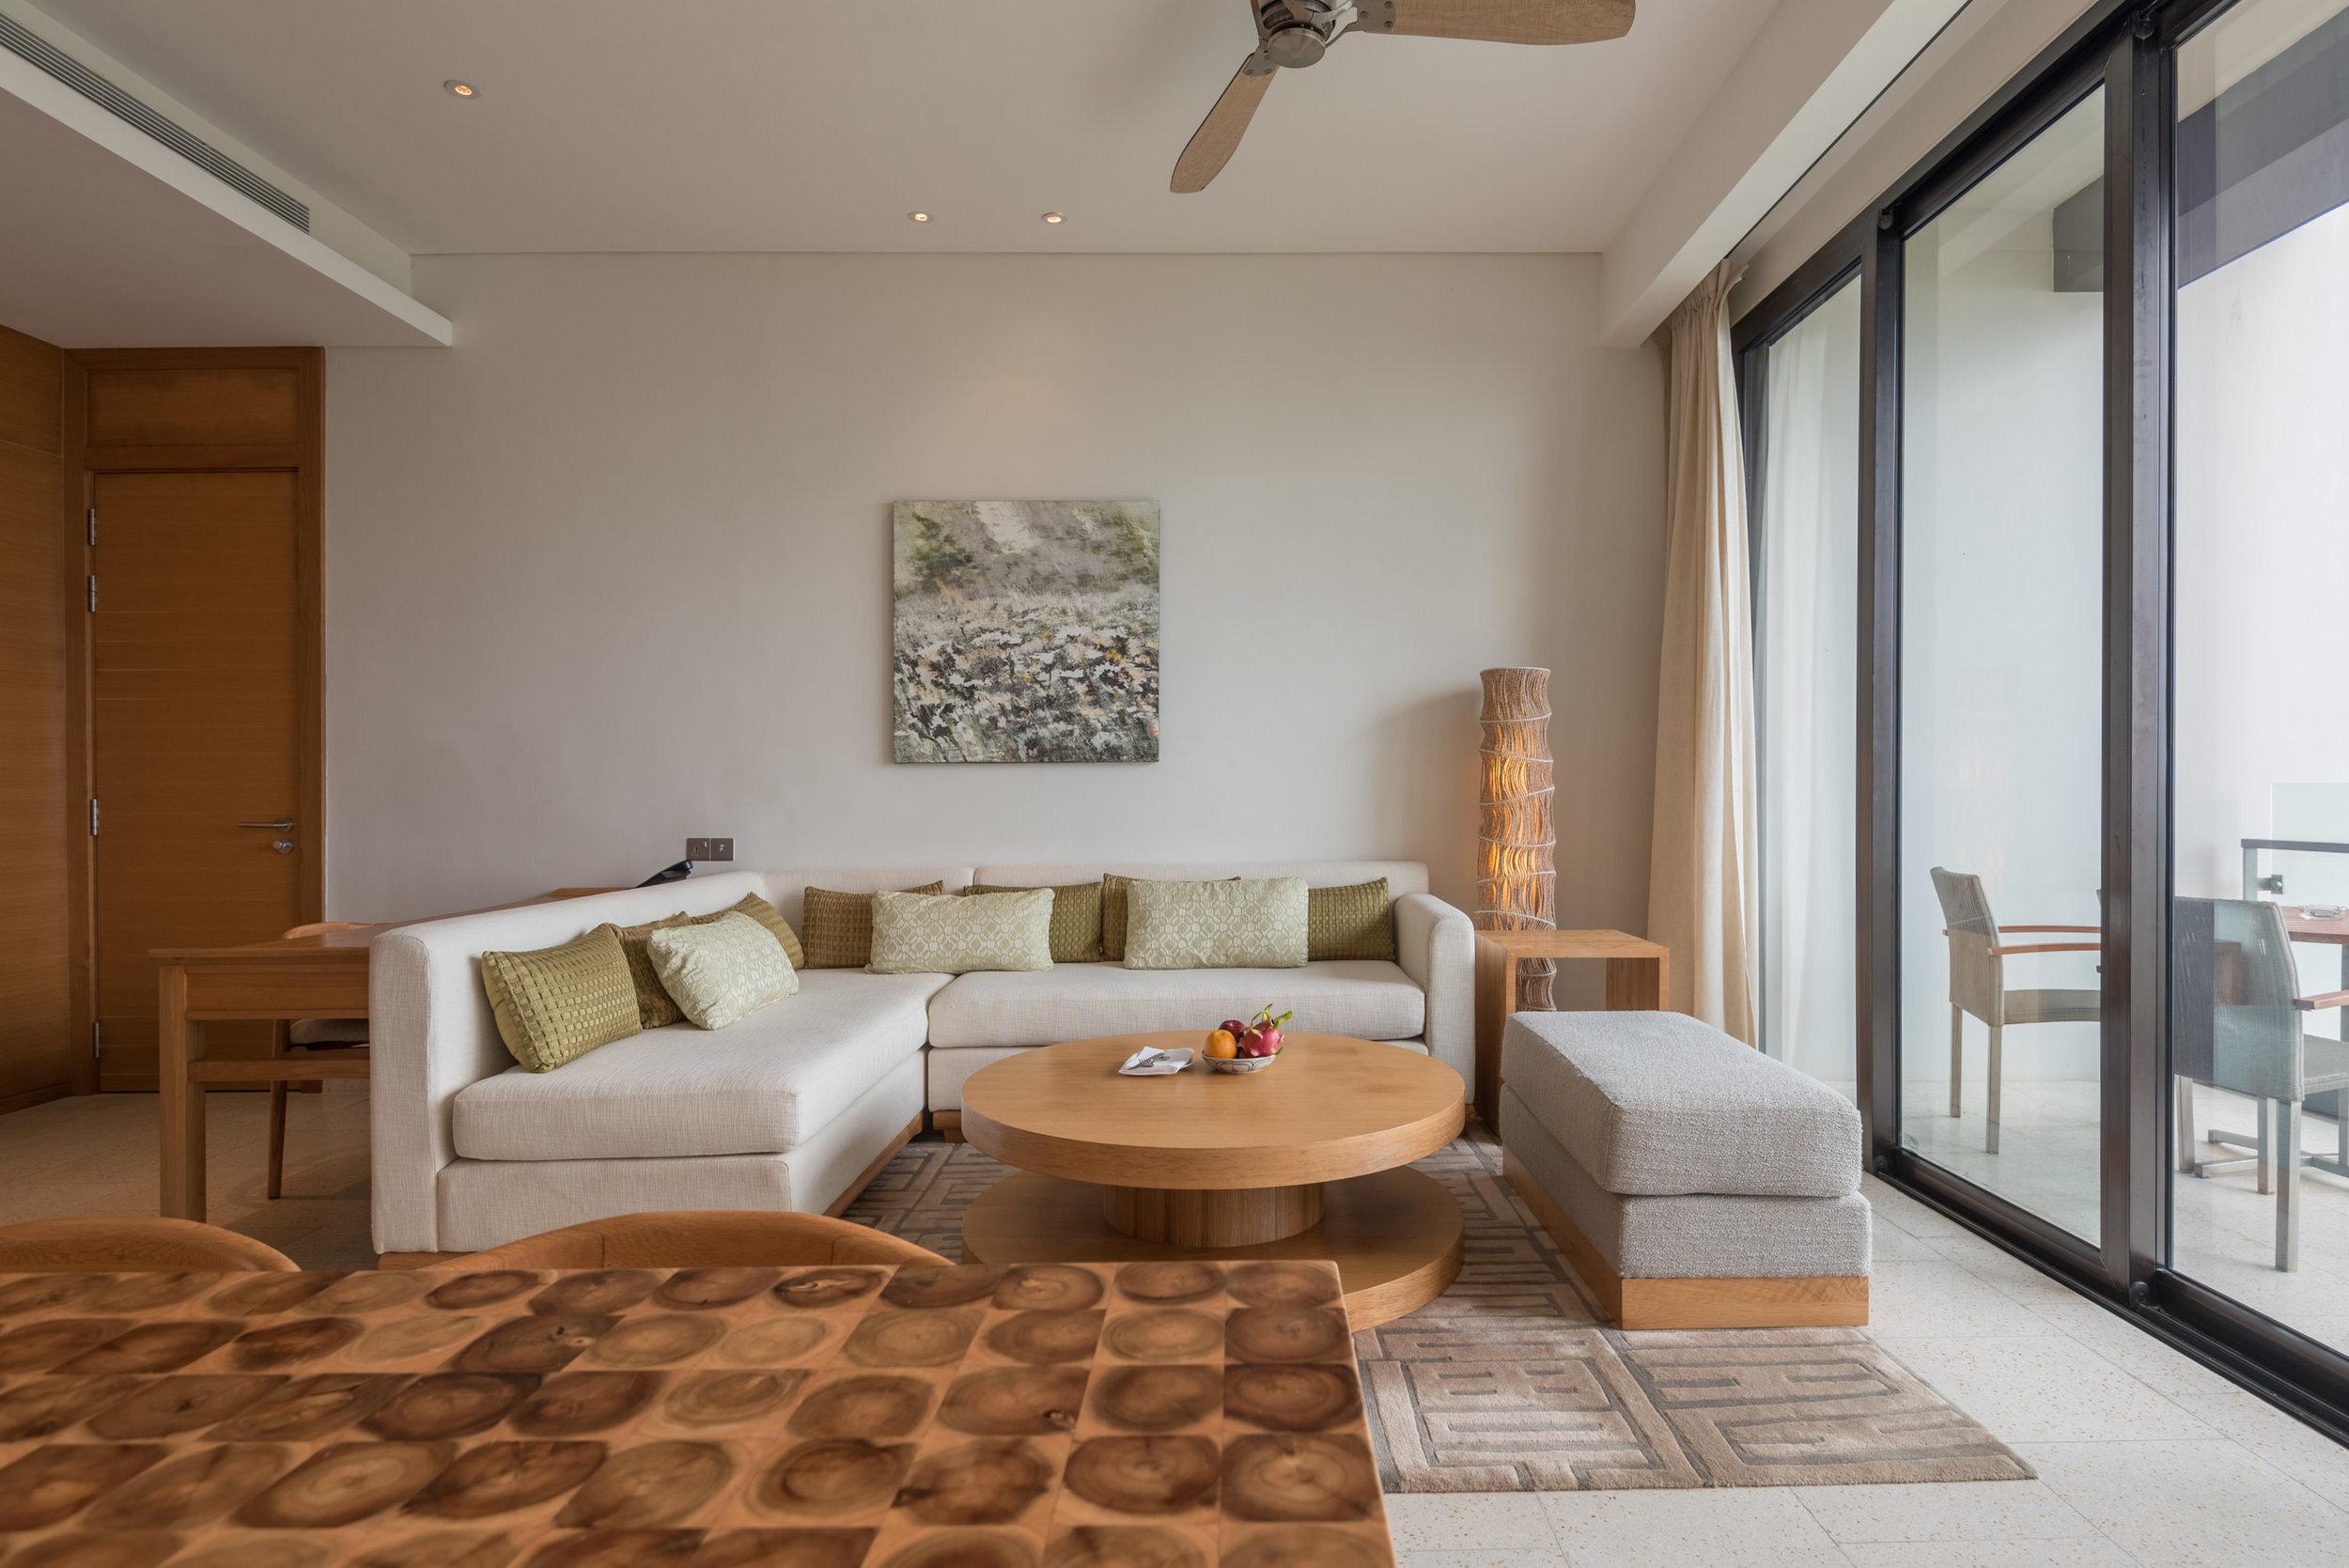 Sofa and Living Area  Regency Suite - Hyatt Regency Danang Resort and Spa